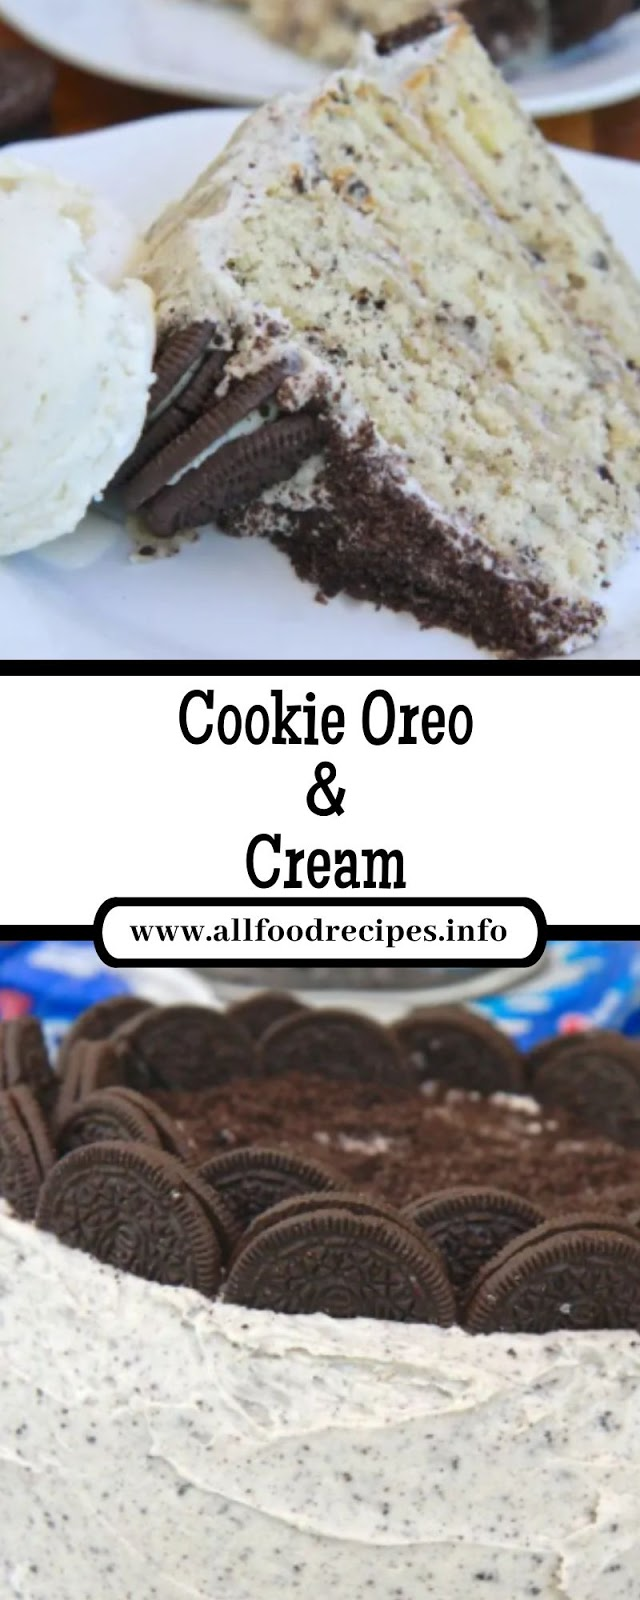 Cookie Oreo & Cream